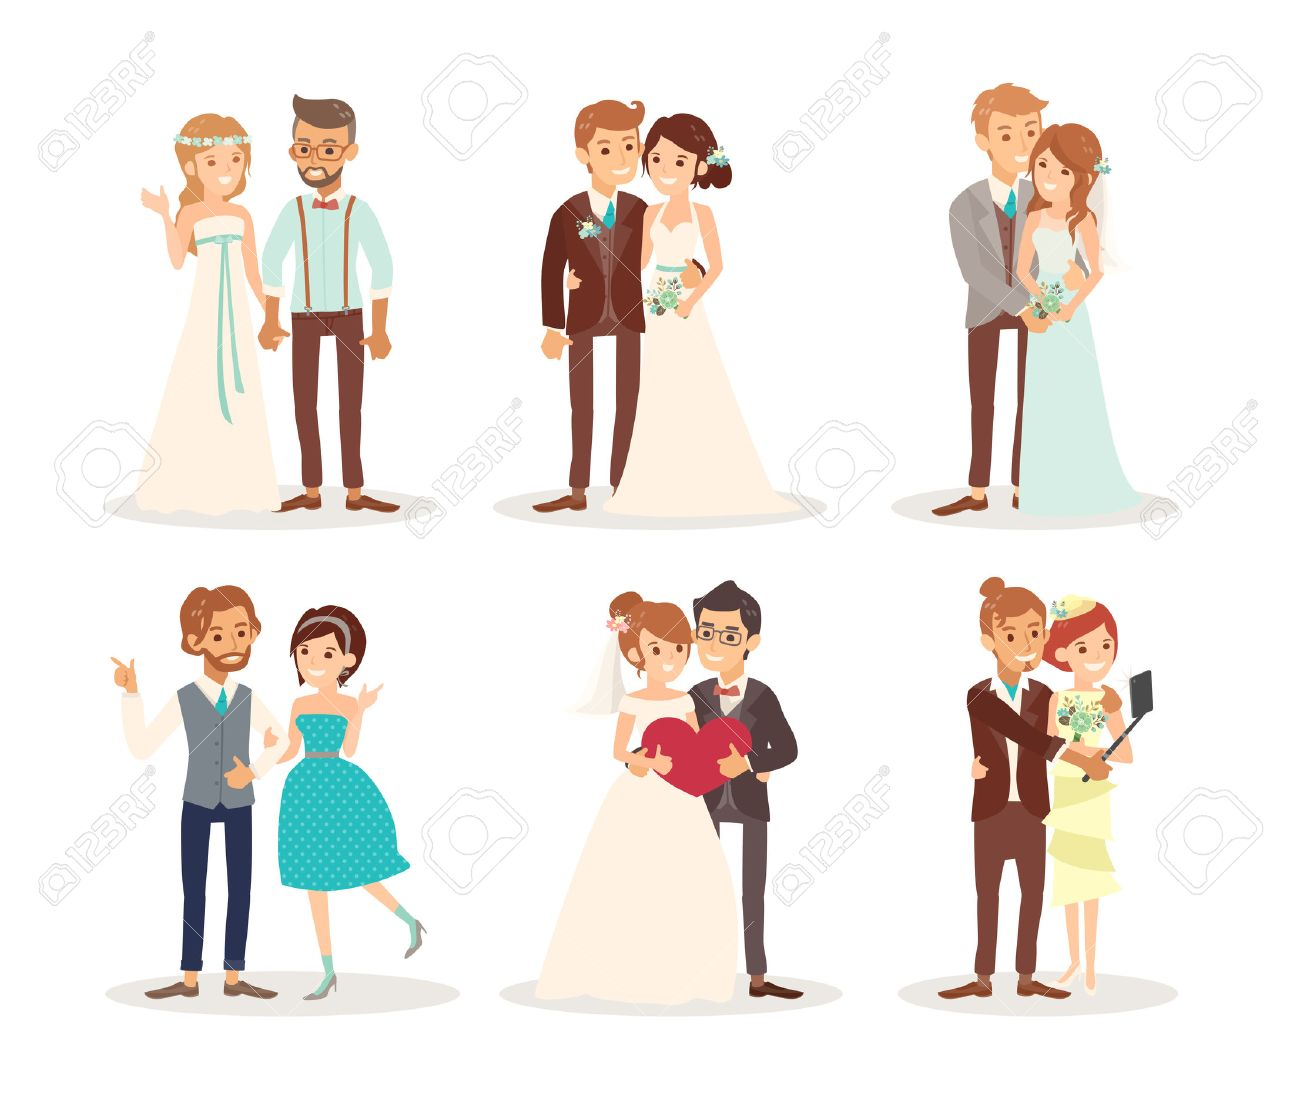 cute wedding couple bride and groom cartoon illustration - 57729379